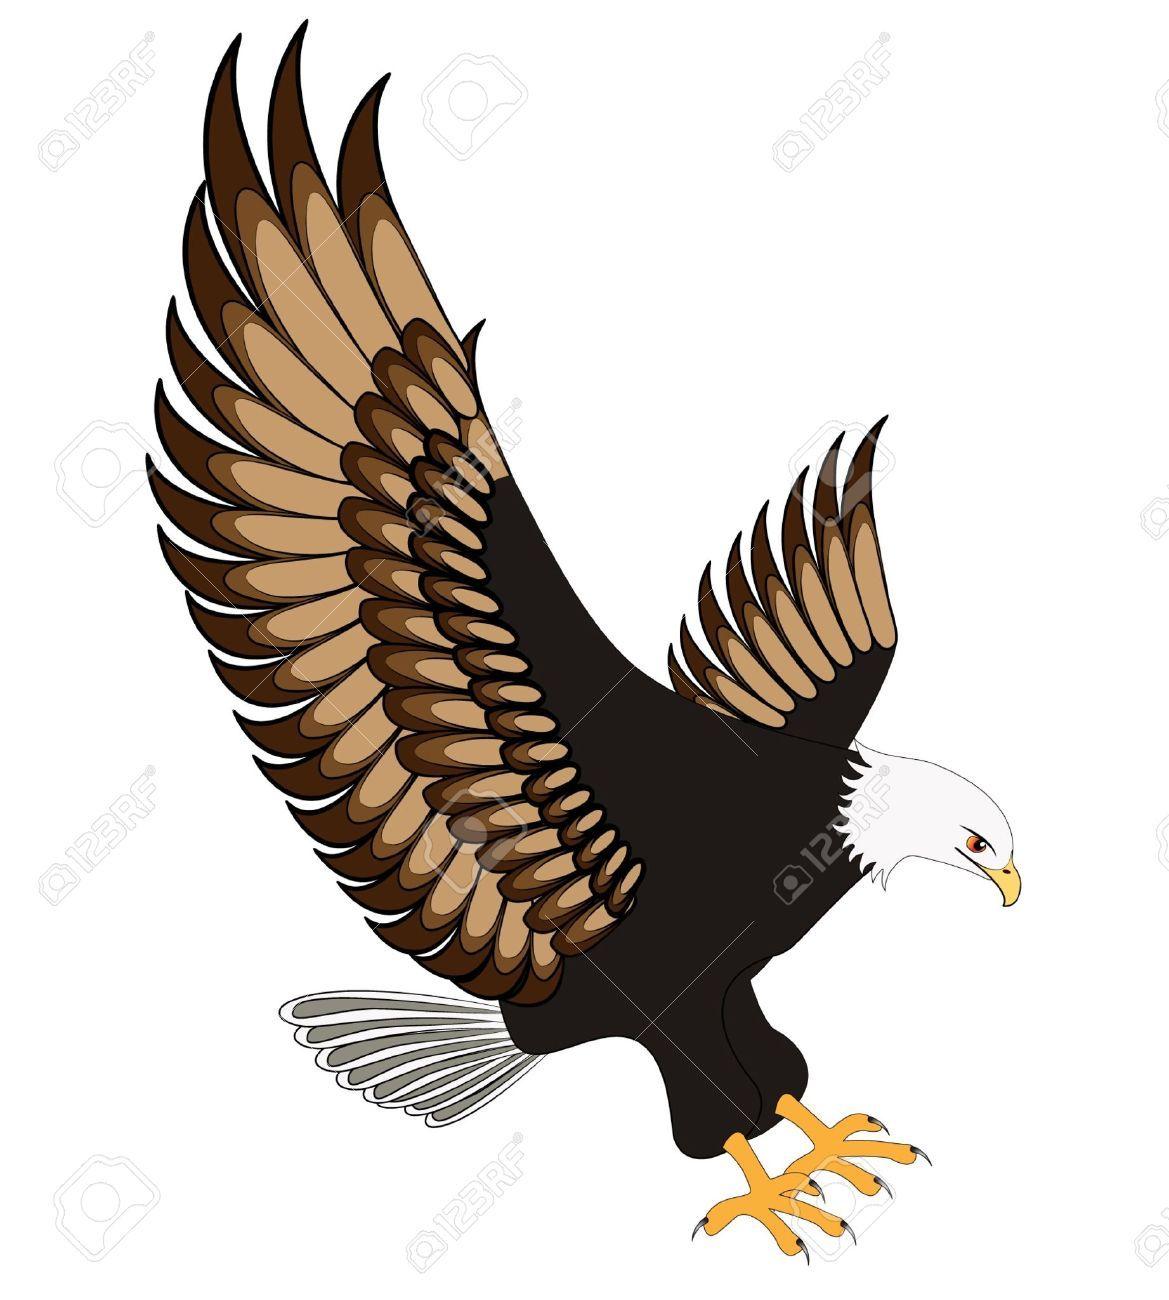 Eagle flying clipart » Clipart Portal.